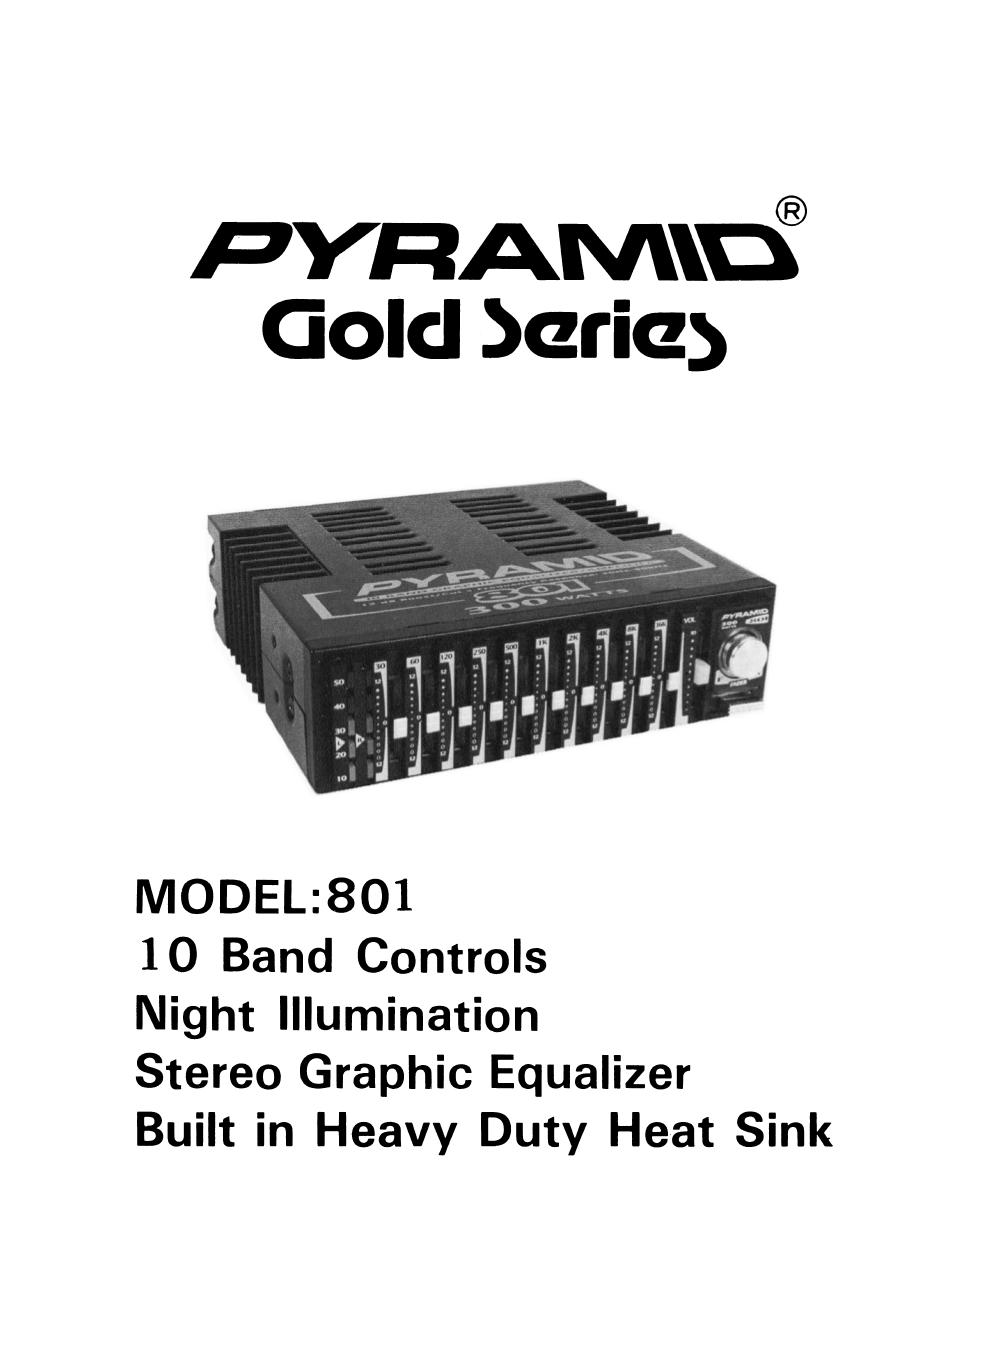 PDF manual for Pyramid Car Amplifier 801